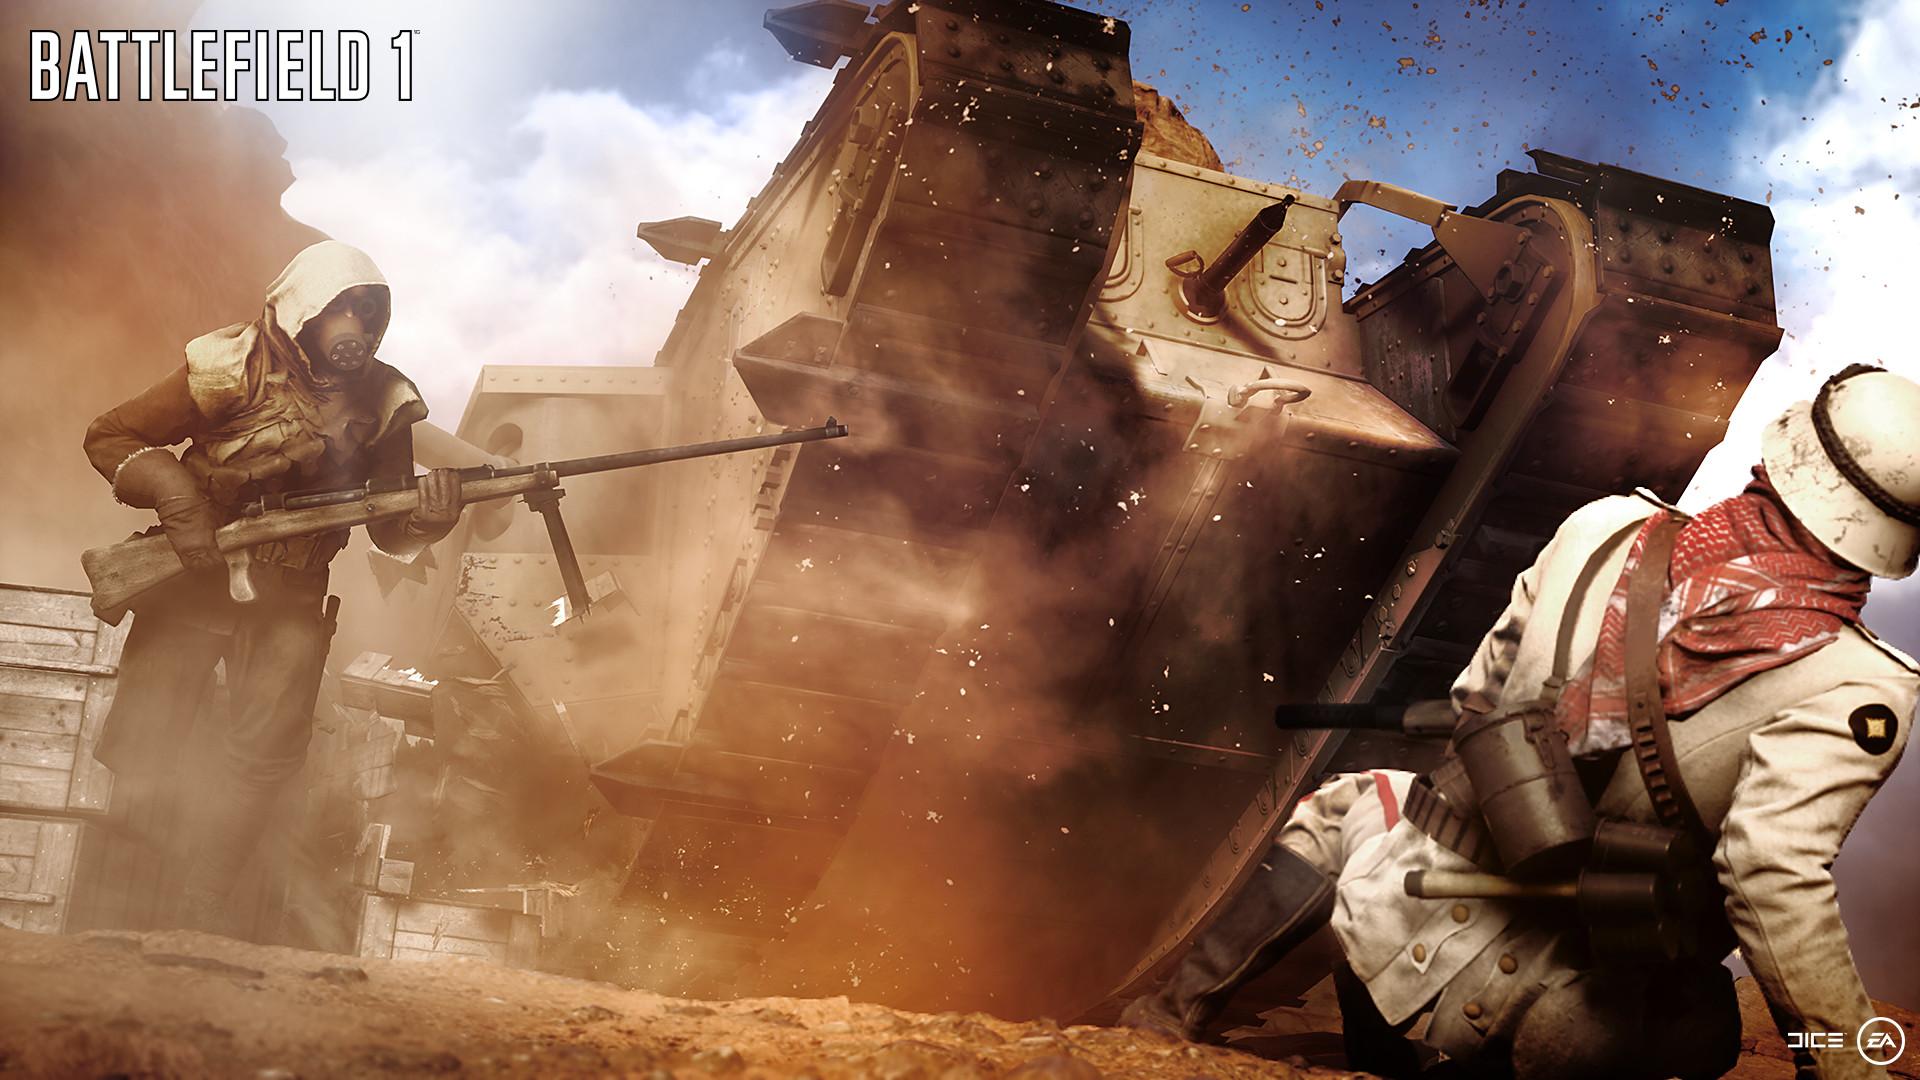 Battlefield 1 New Videos Showcase New Mechanics, Alpha Weapons , New